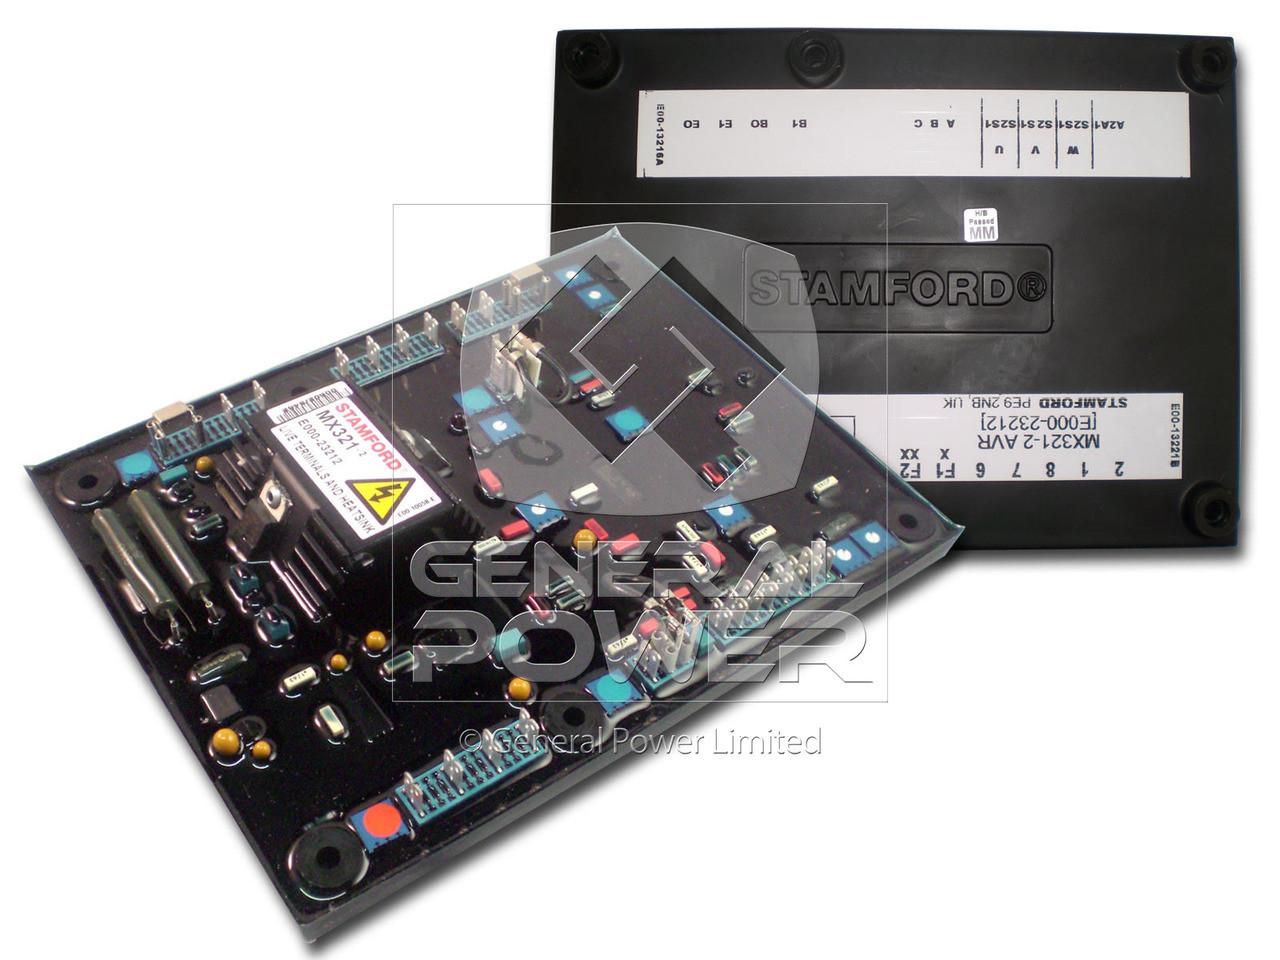 Isolation Transformer Wiring Diagram Onan Avr Great Installation On Electrical Stamford Mx321 Original Voltage Regulator Rh Genpowerusa Com Power